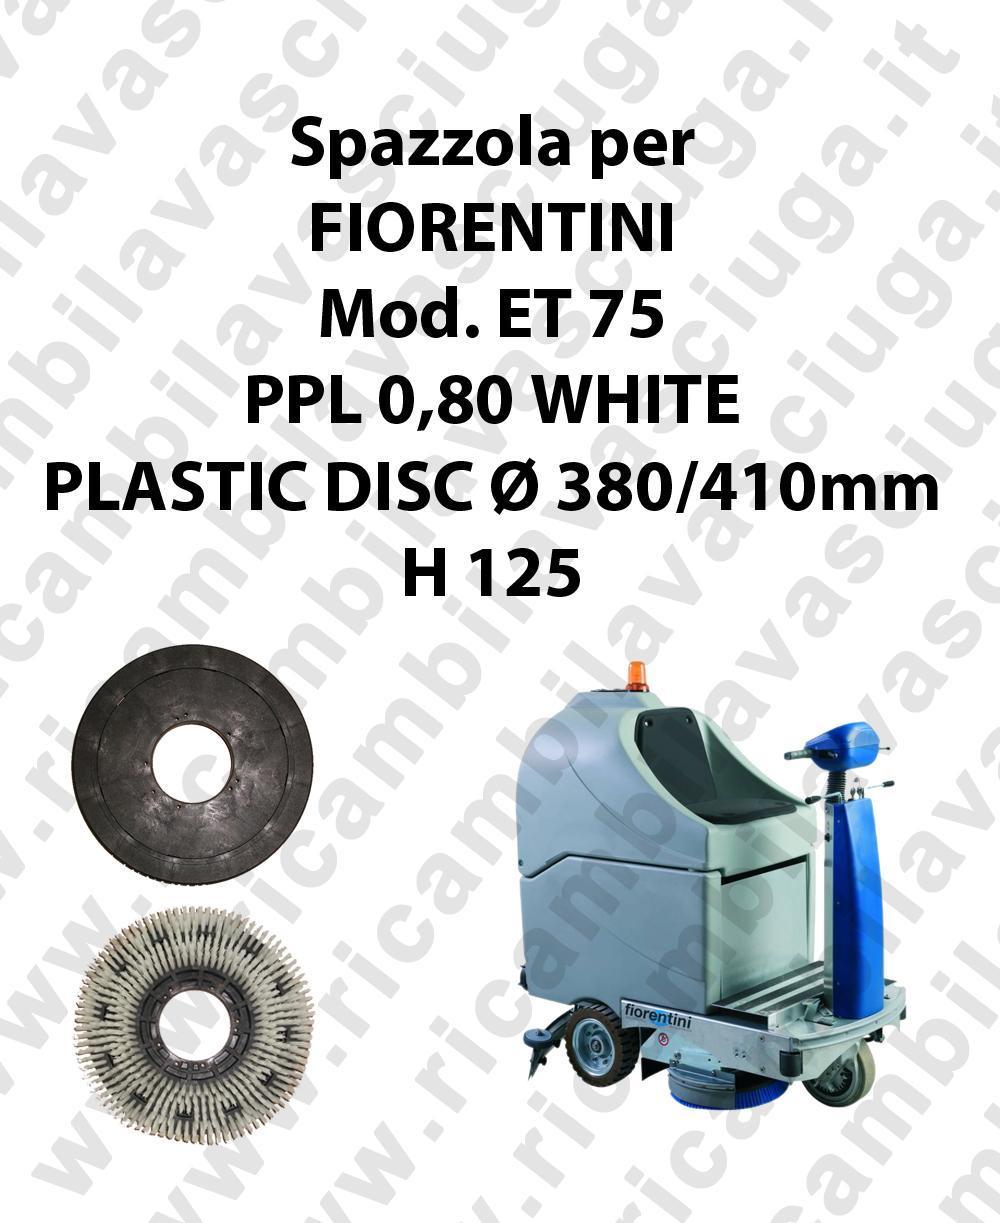 CEPILLO DE LAVADO PPL 0,80 WHITE para fregadora FIORENTINI modelo ET 75